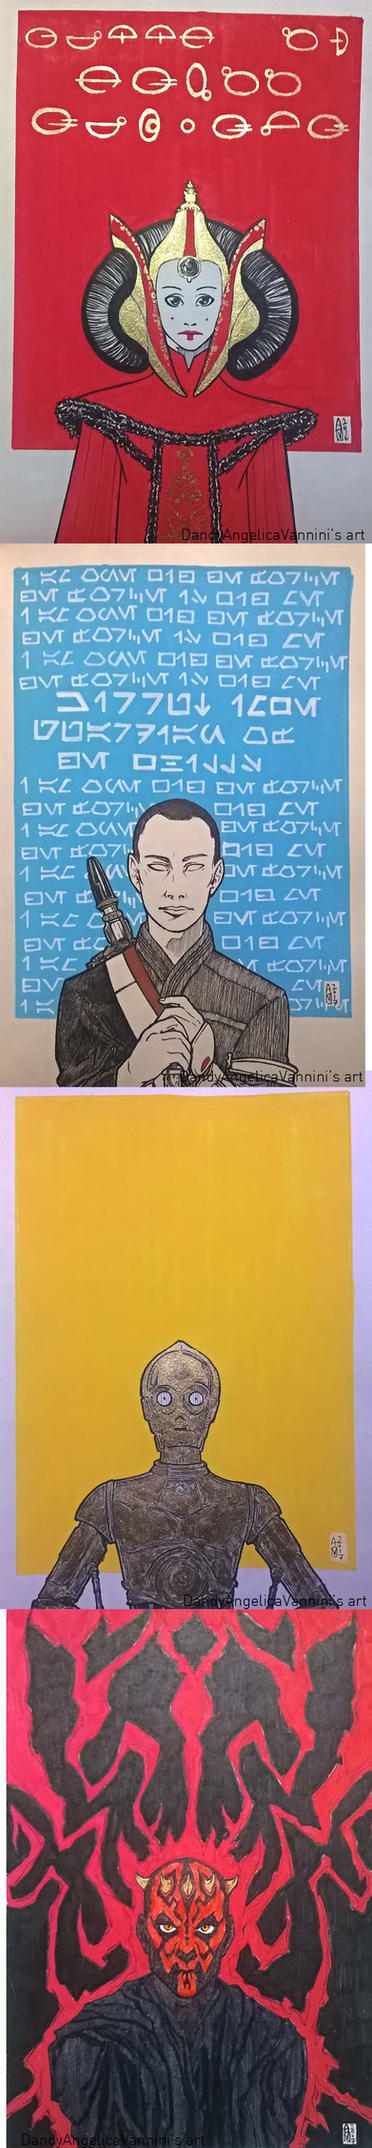 Star Wars Portraits, (1-4) by DandyAngelicaVannini